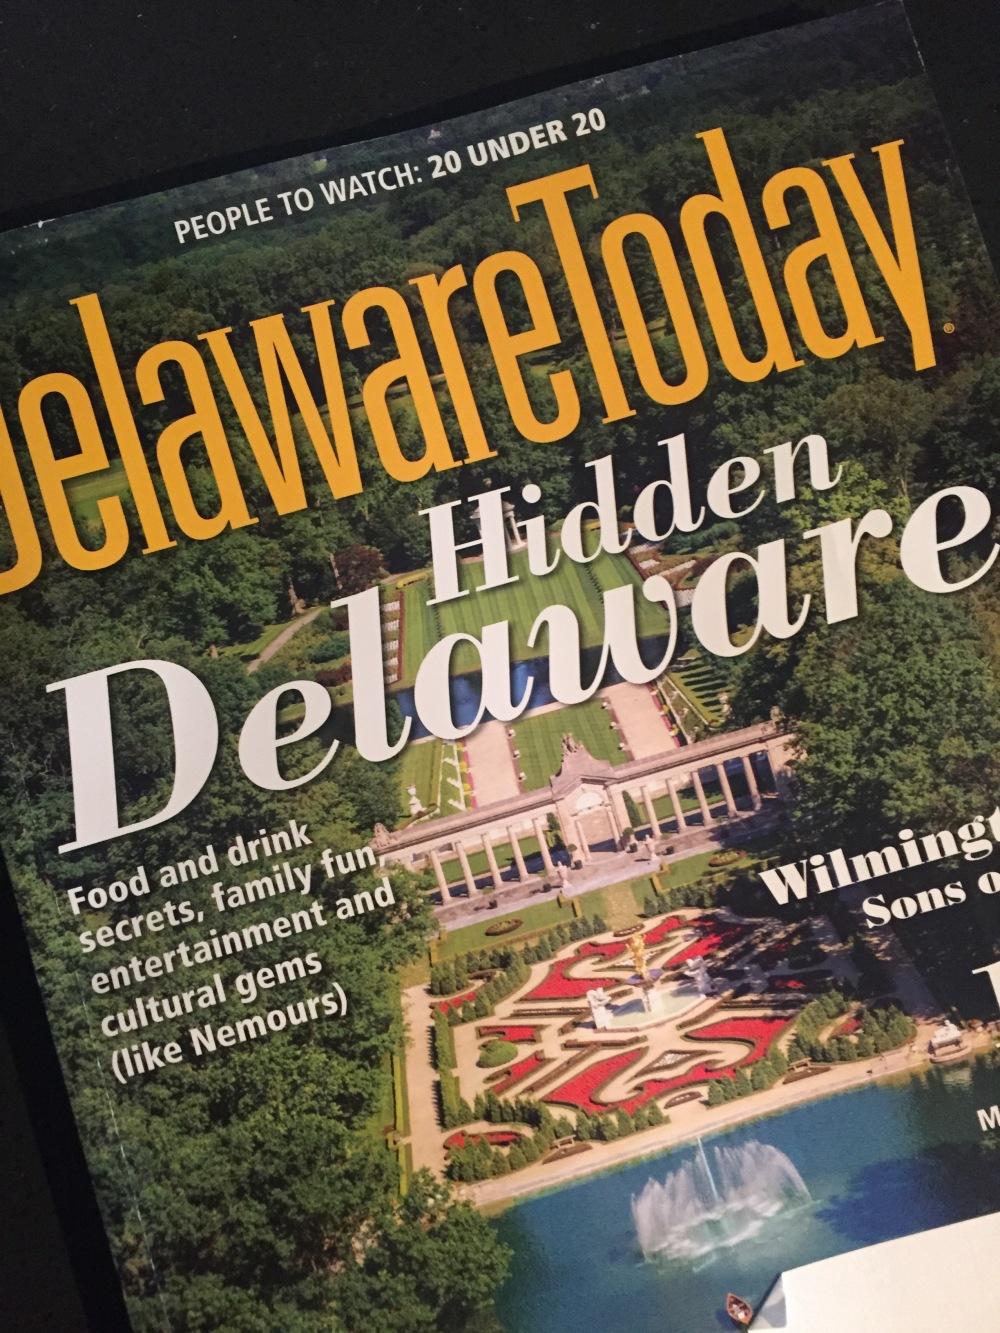 Delaware Today photo shoot